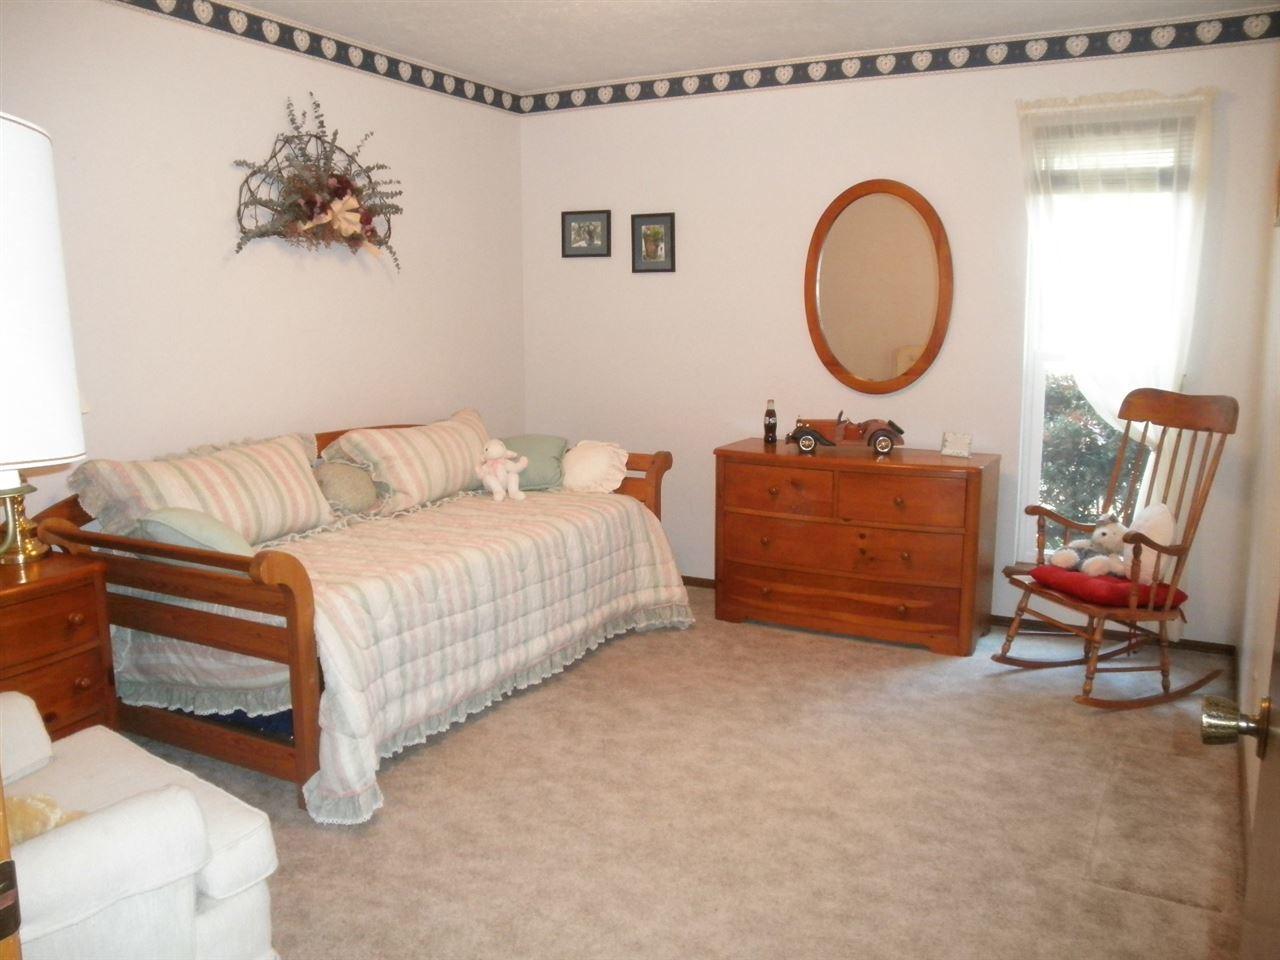 Sold Cross Sale W/ MLS | 1275 S Enterprise Road  Ponca City, OK 74604 11